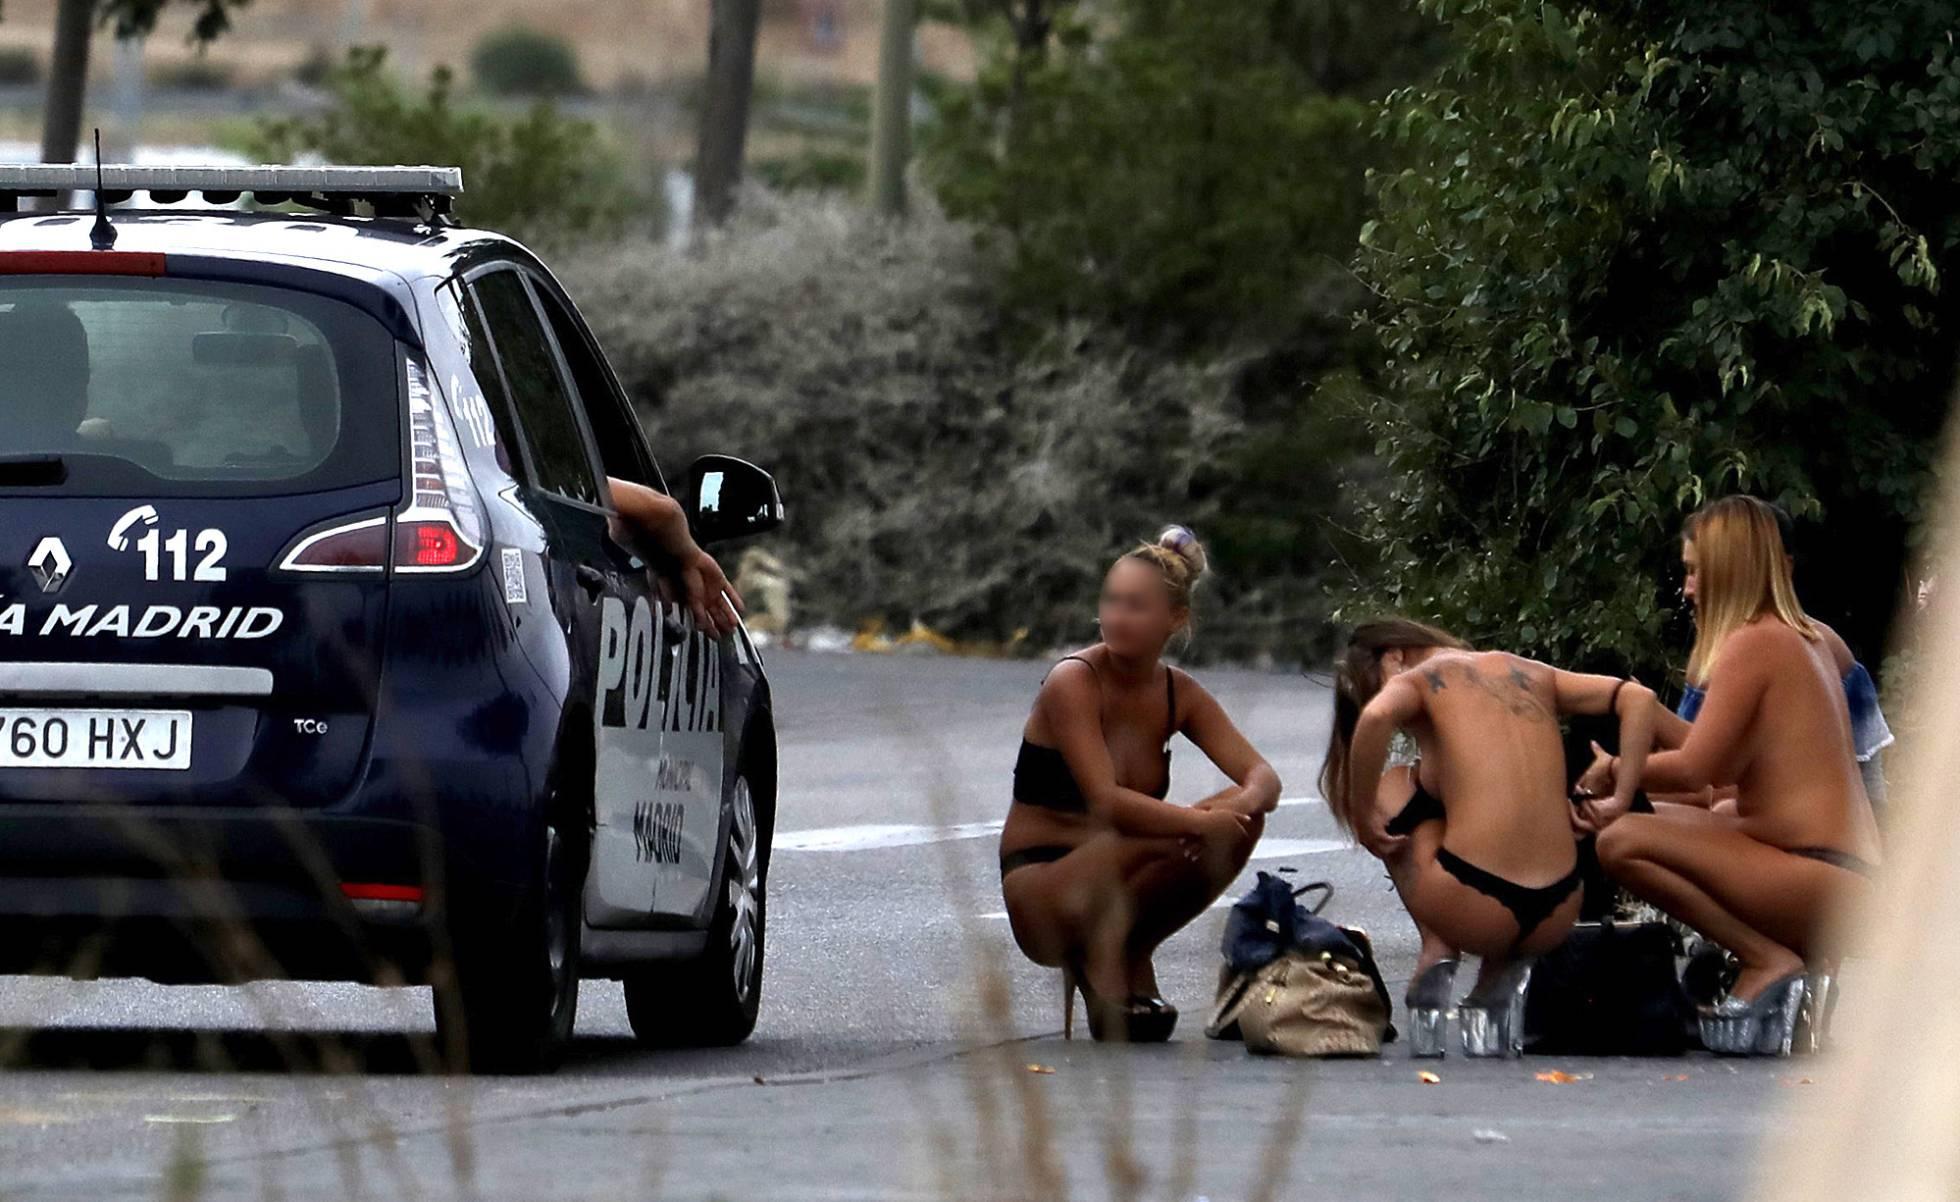 prostitutas españolas desnudas prostitutas coche zaragoza